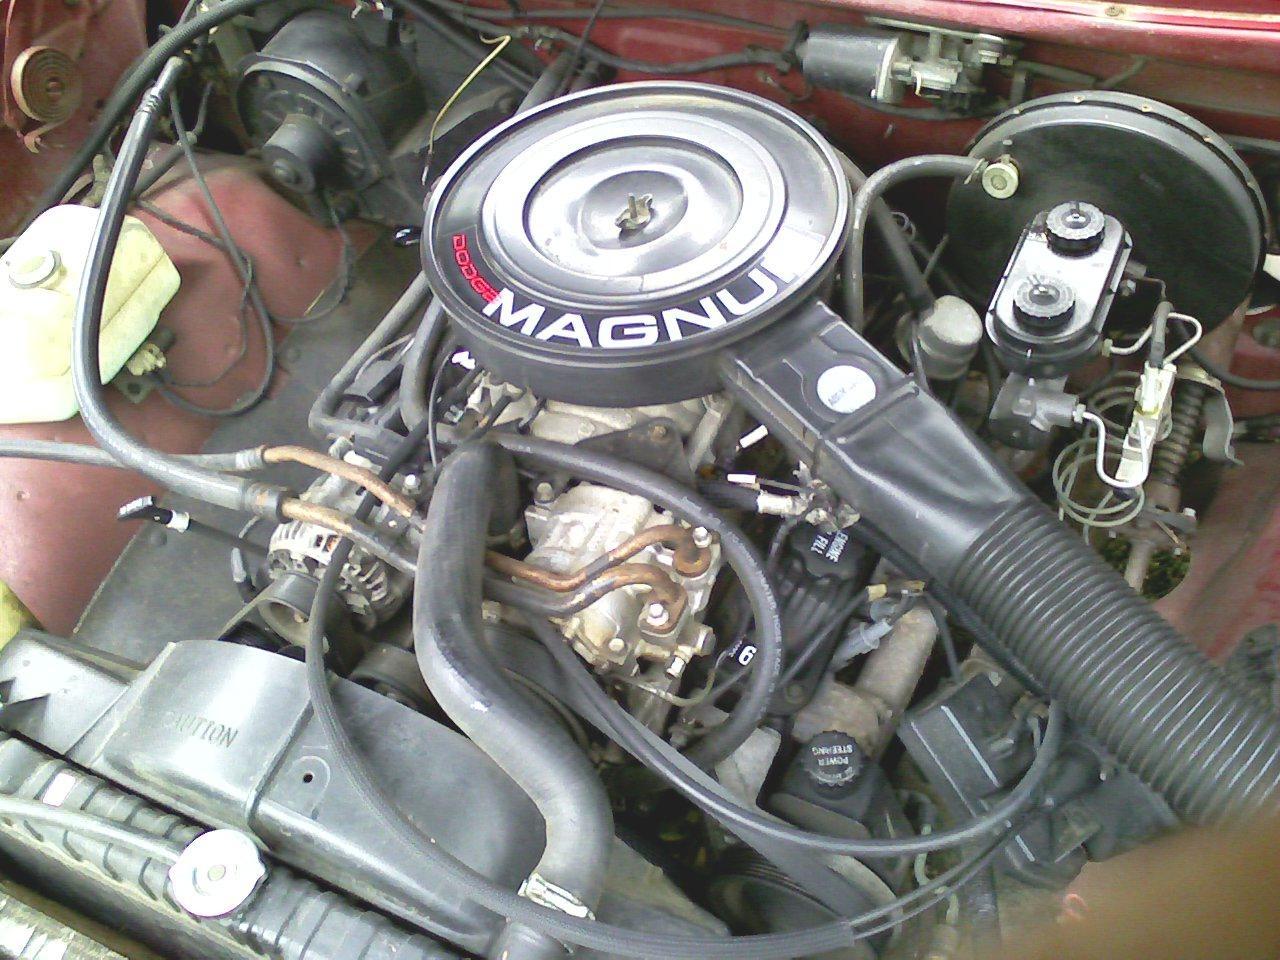 87 Dodge W150 Wiring Diagram Dodge Ram 150 Questions 92 Dodge Cargurus